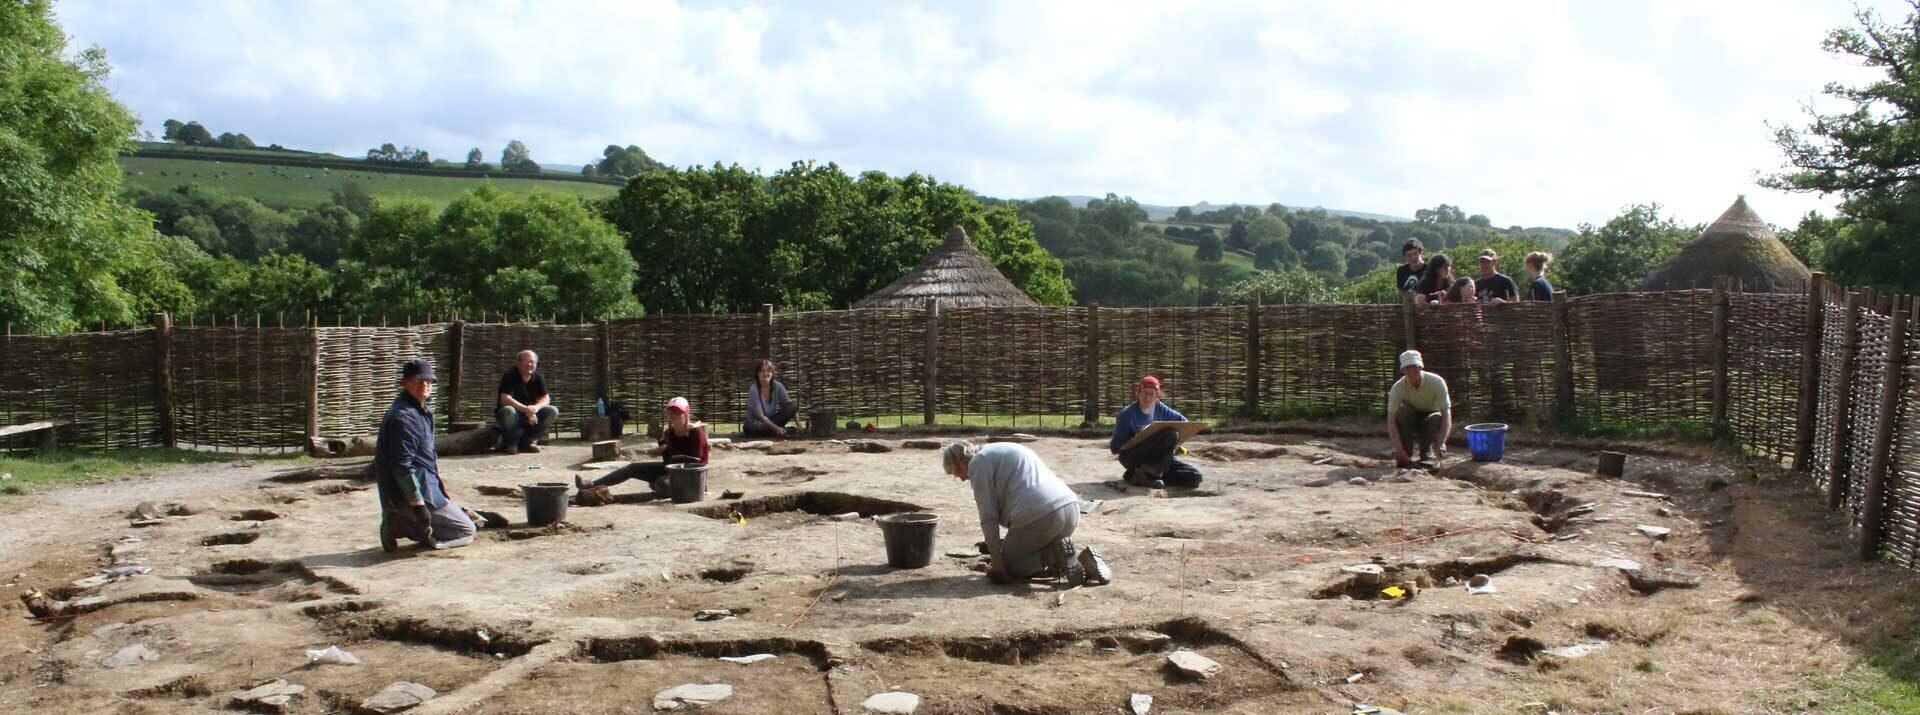 Dyfed Archaeological Trust